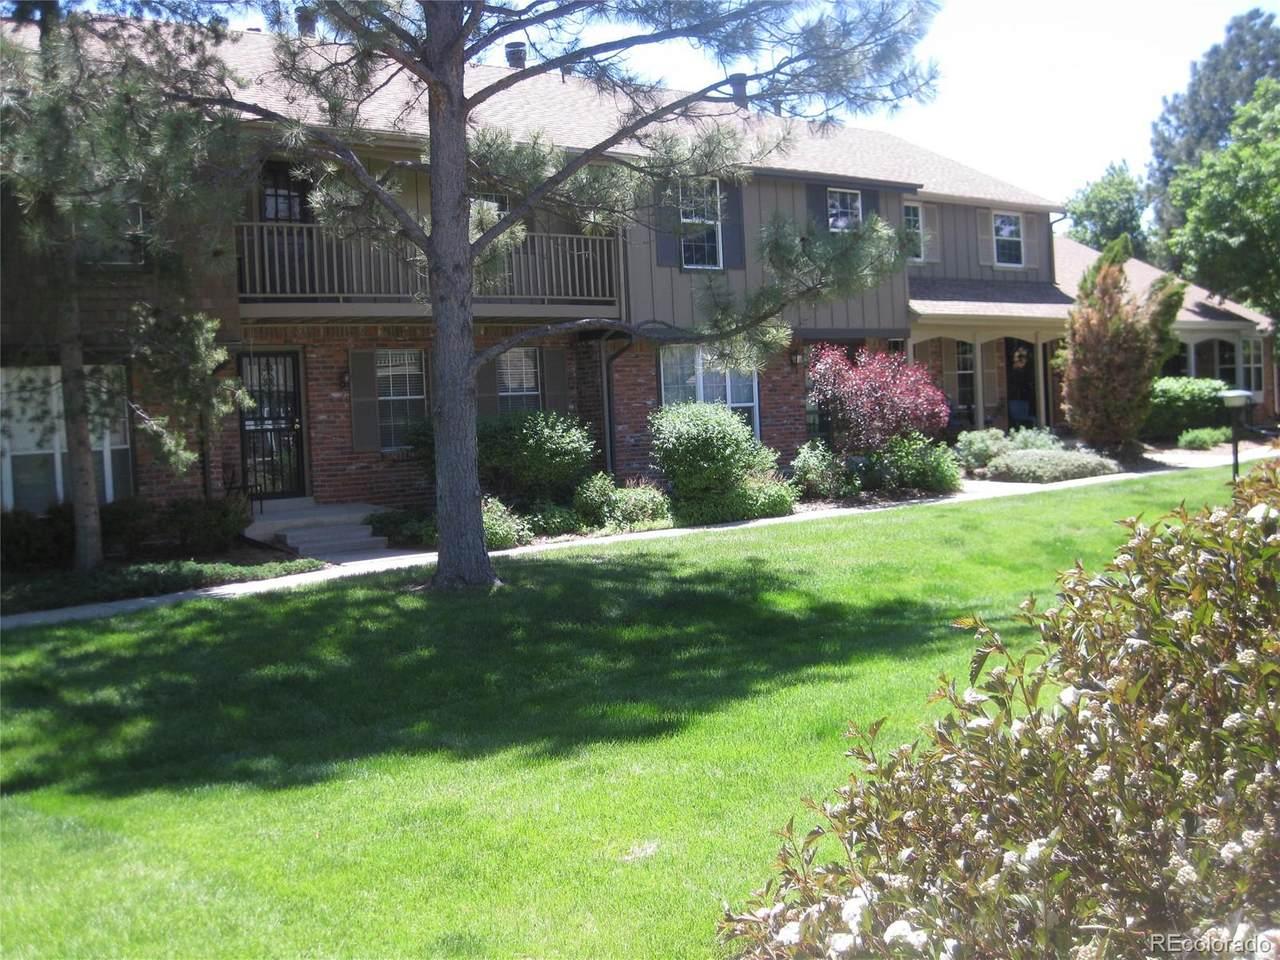 9050 Cherry Creek South Drive - Photo 1